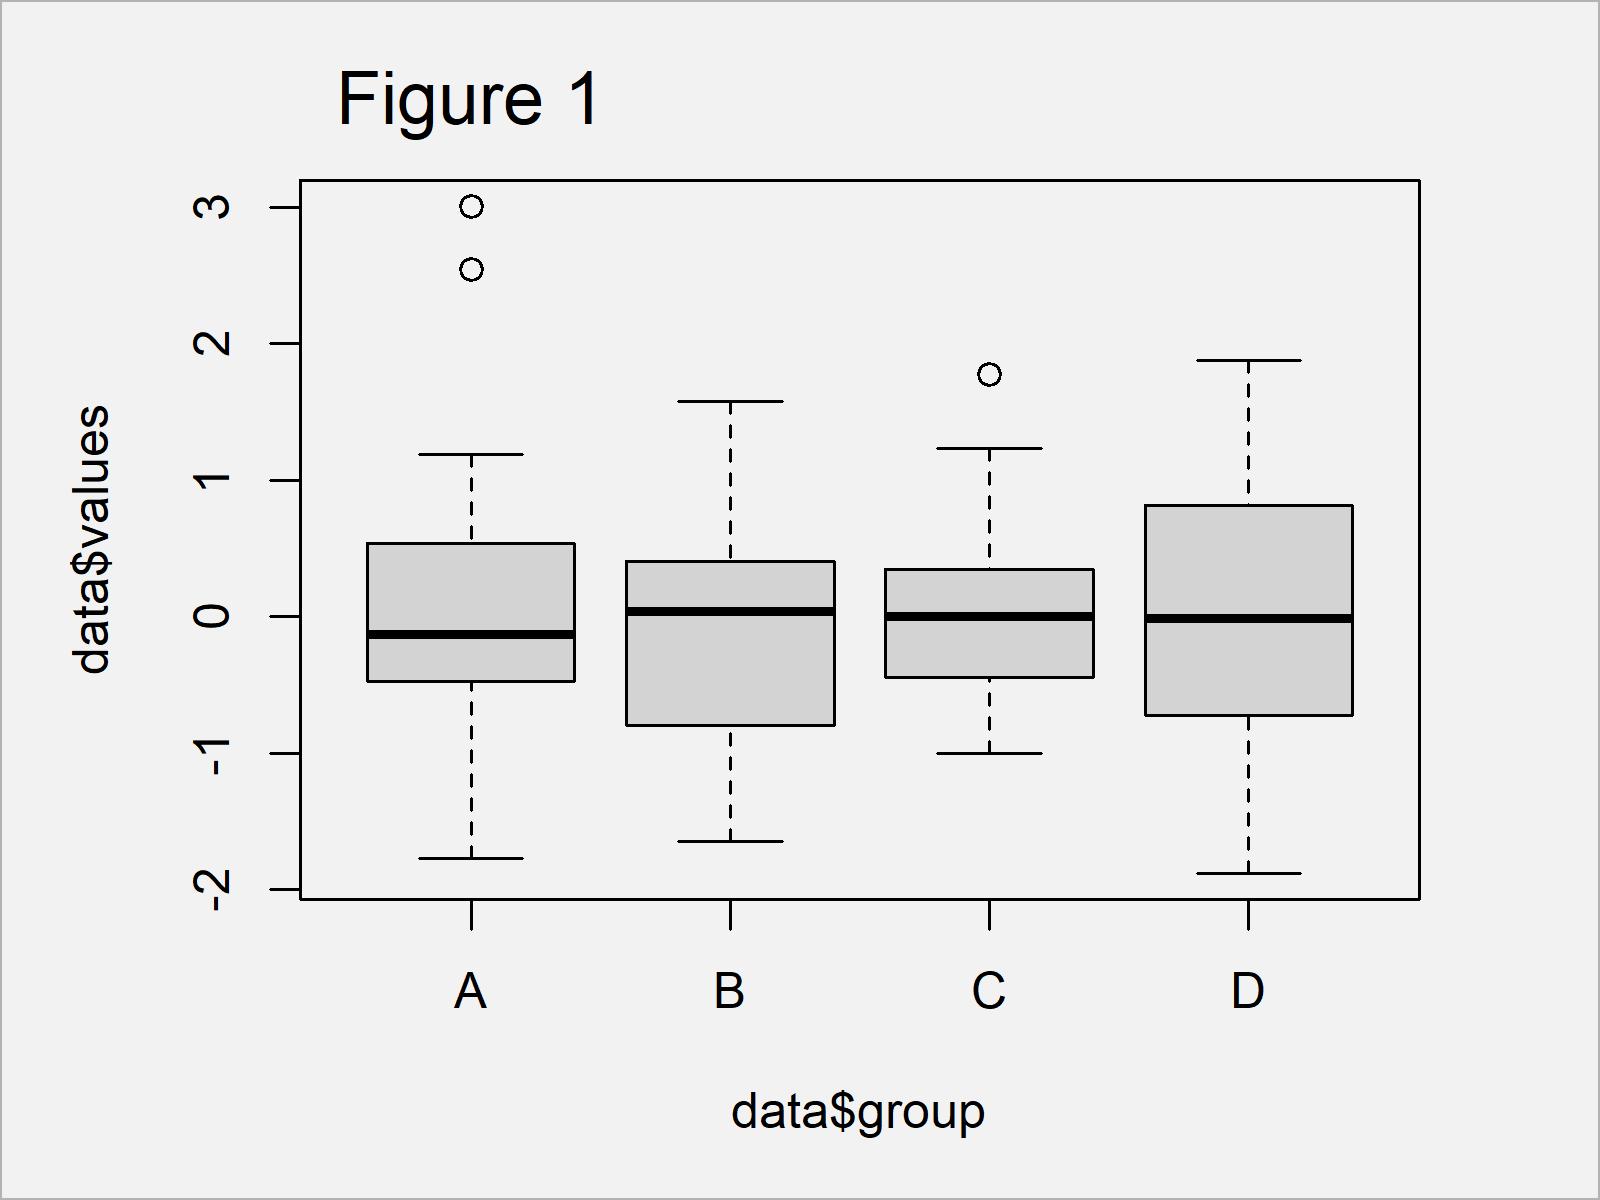 r graph figure 1 reorder boxplot